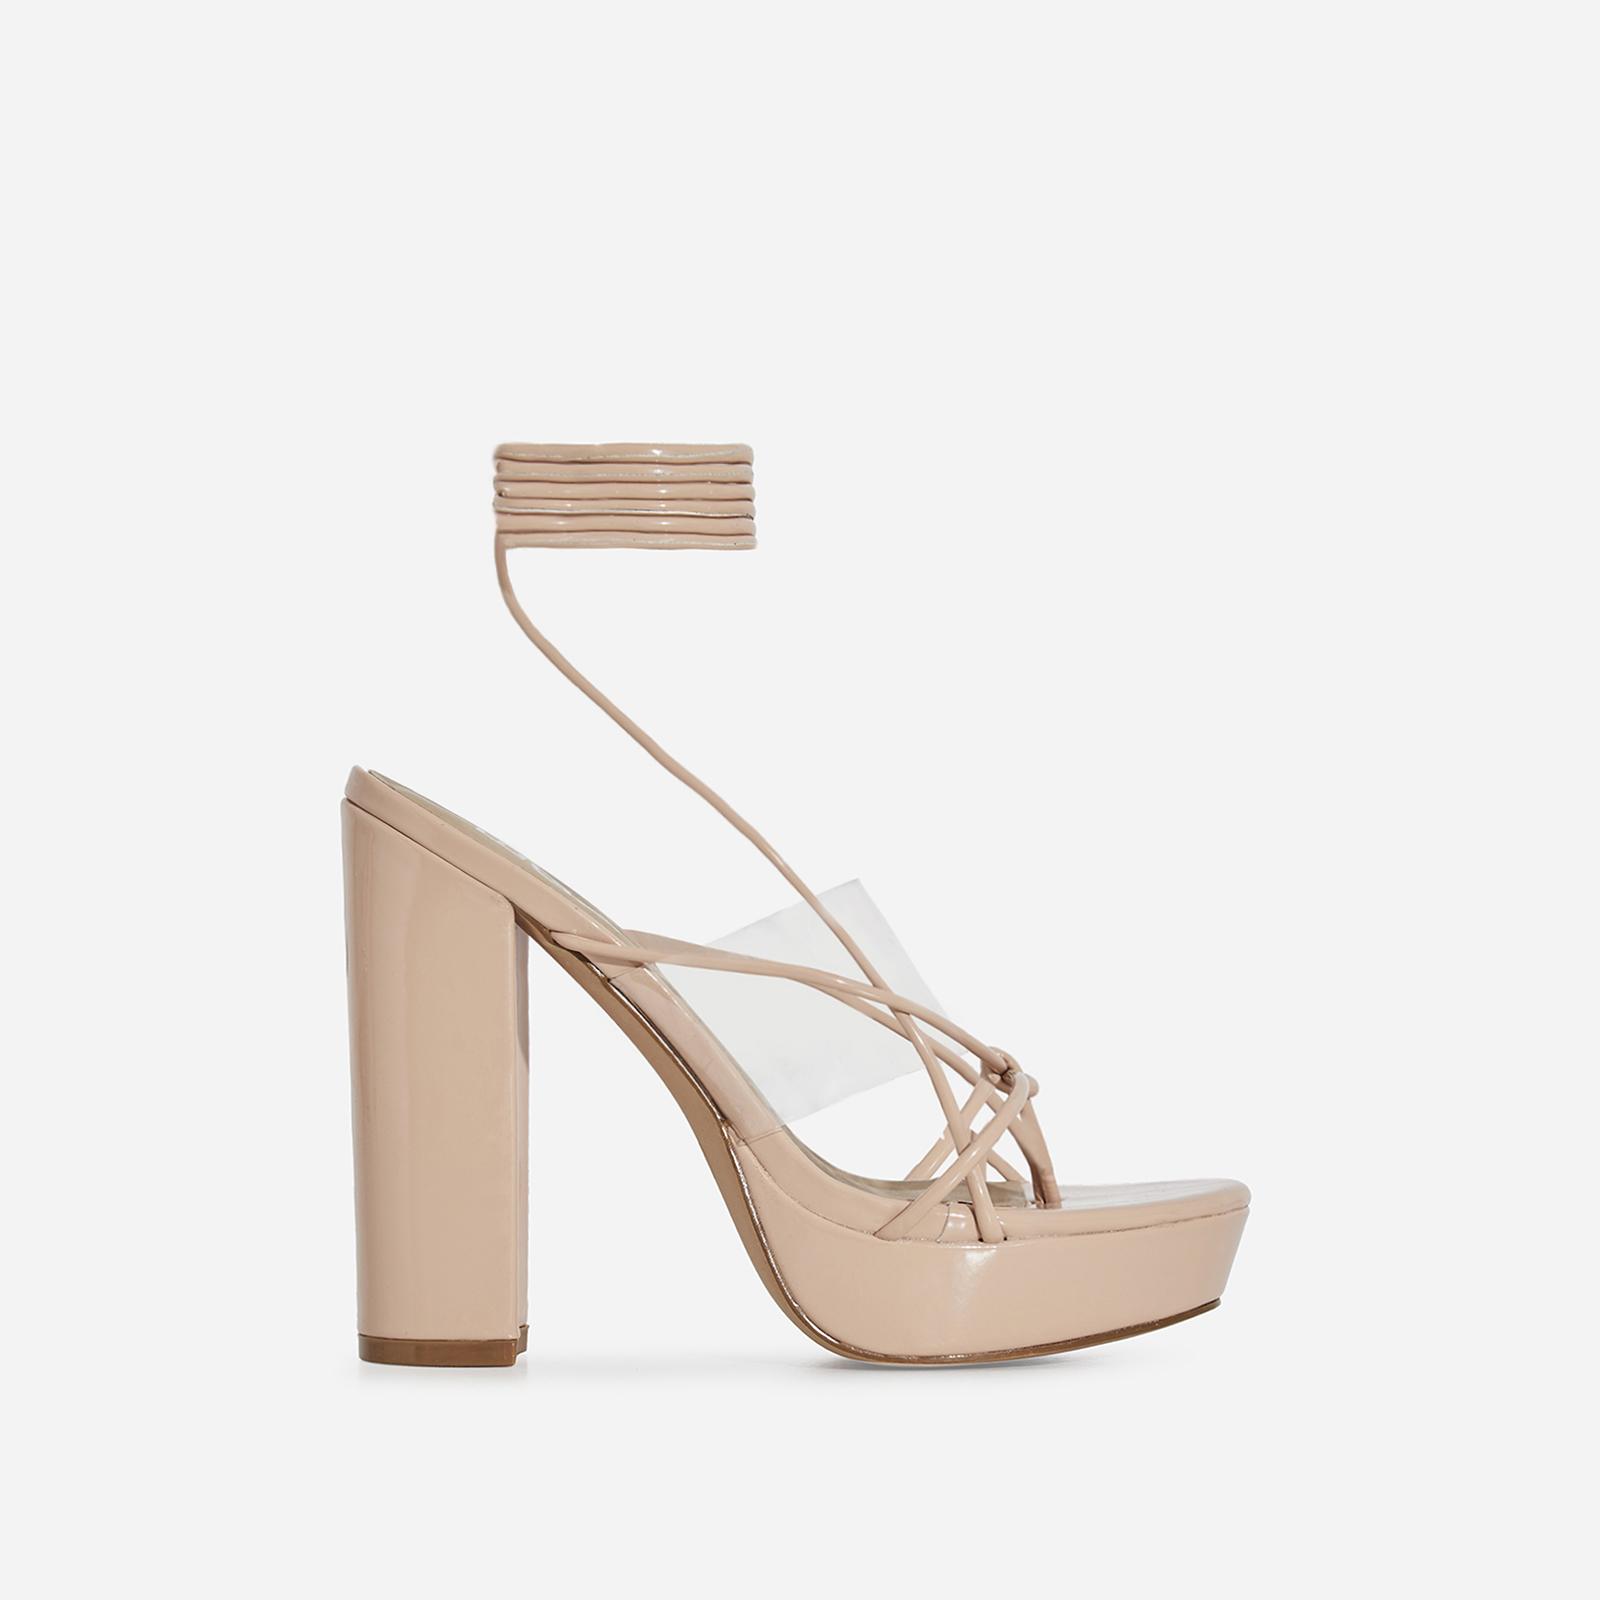 Jamie Lace Up Perspex Platform Heel In Nude Patent